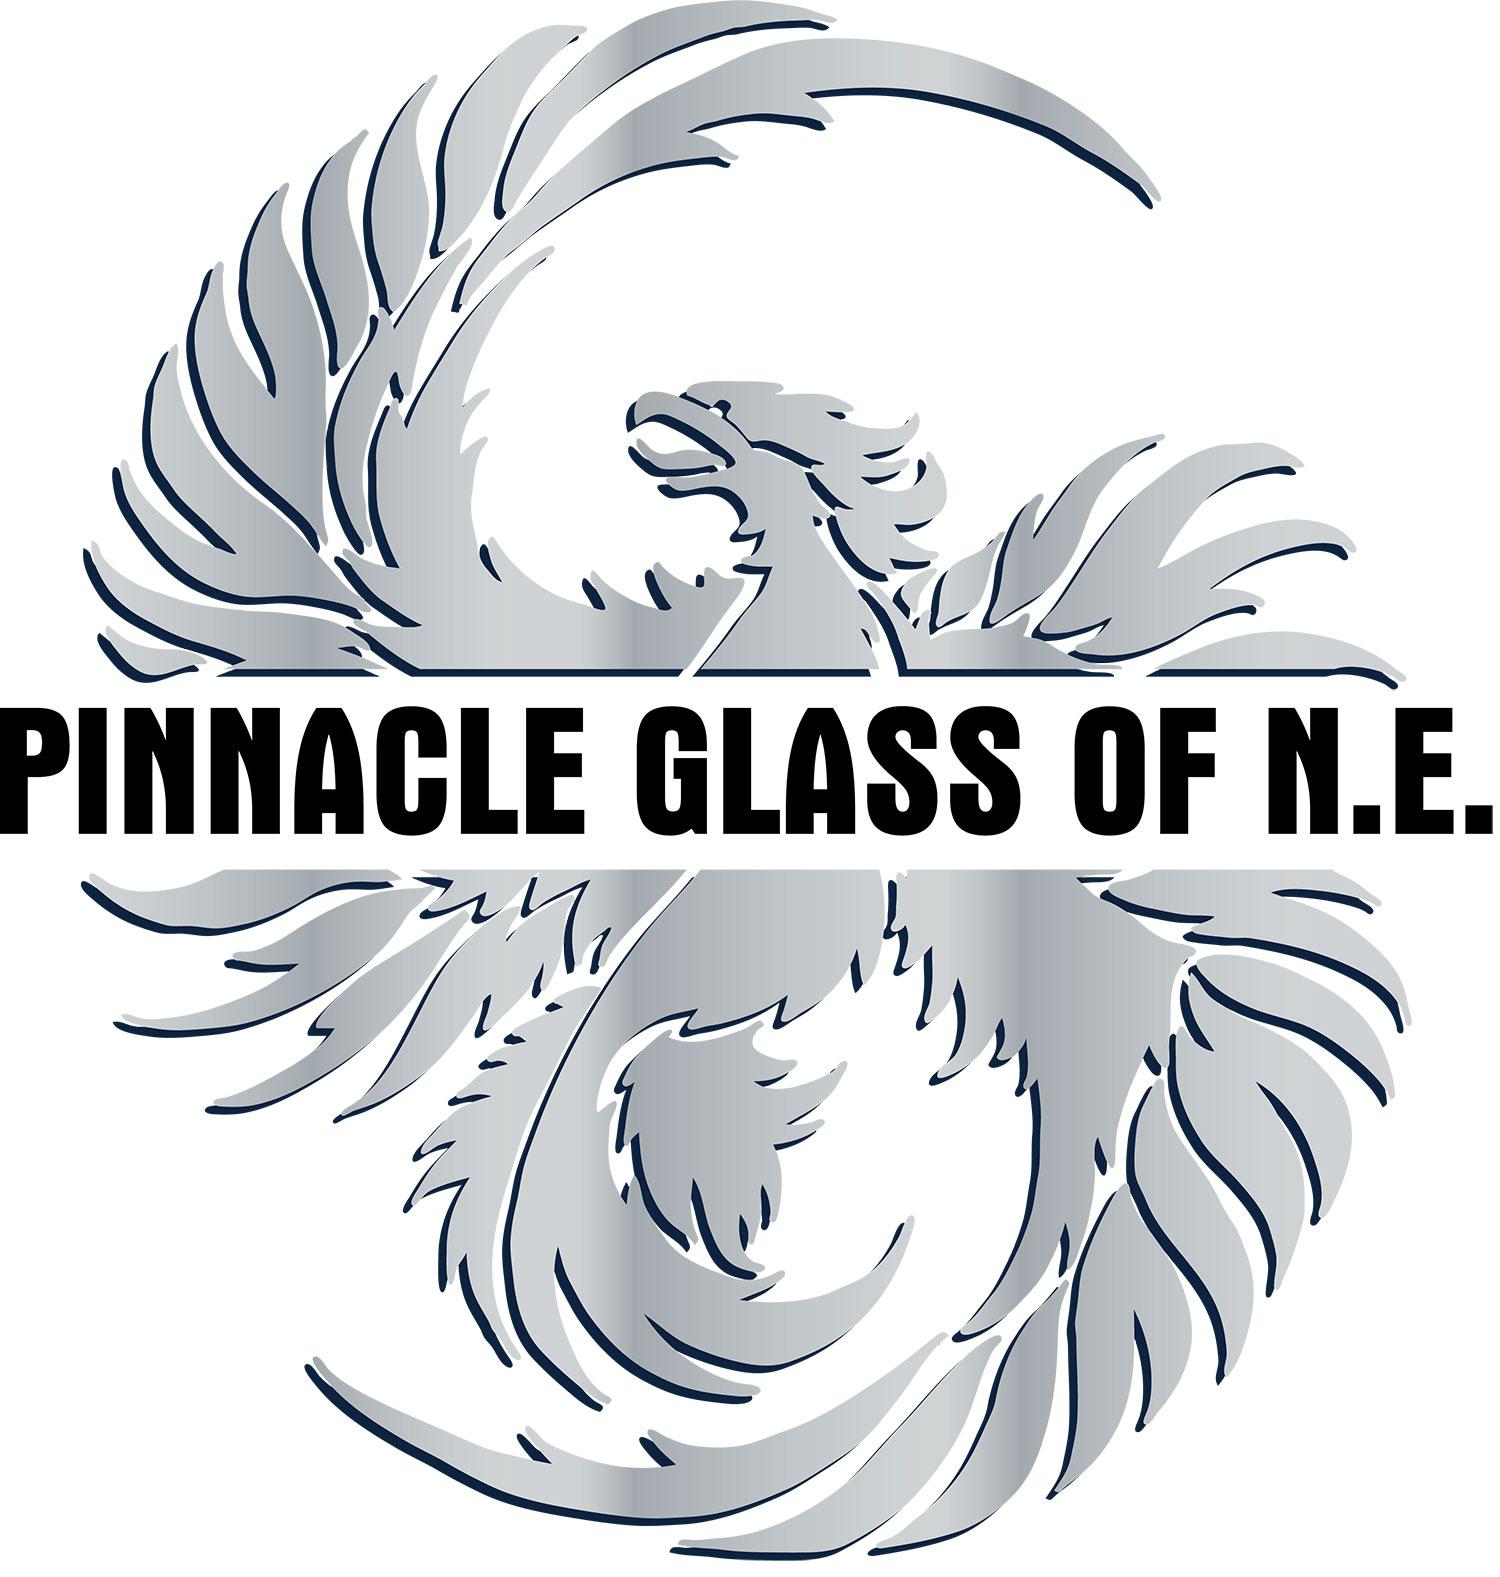 carbon-creative-providence-rhode-island-pinnacle-glass.jpg